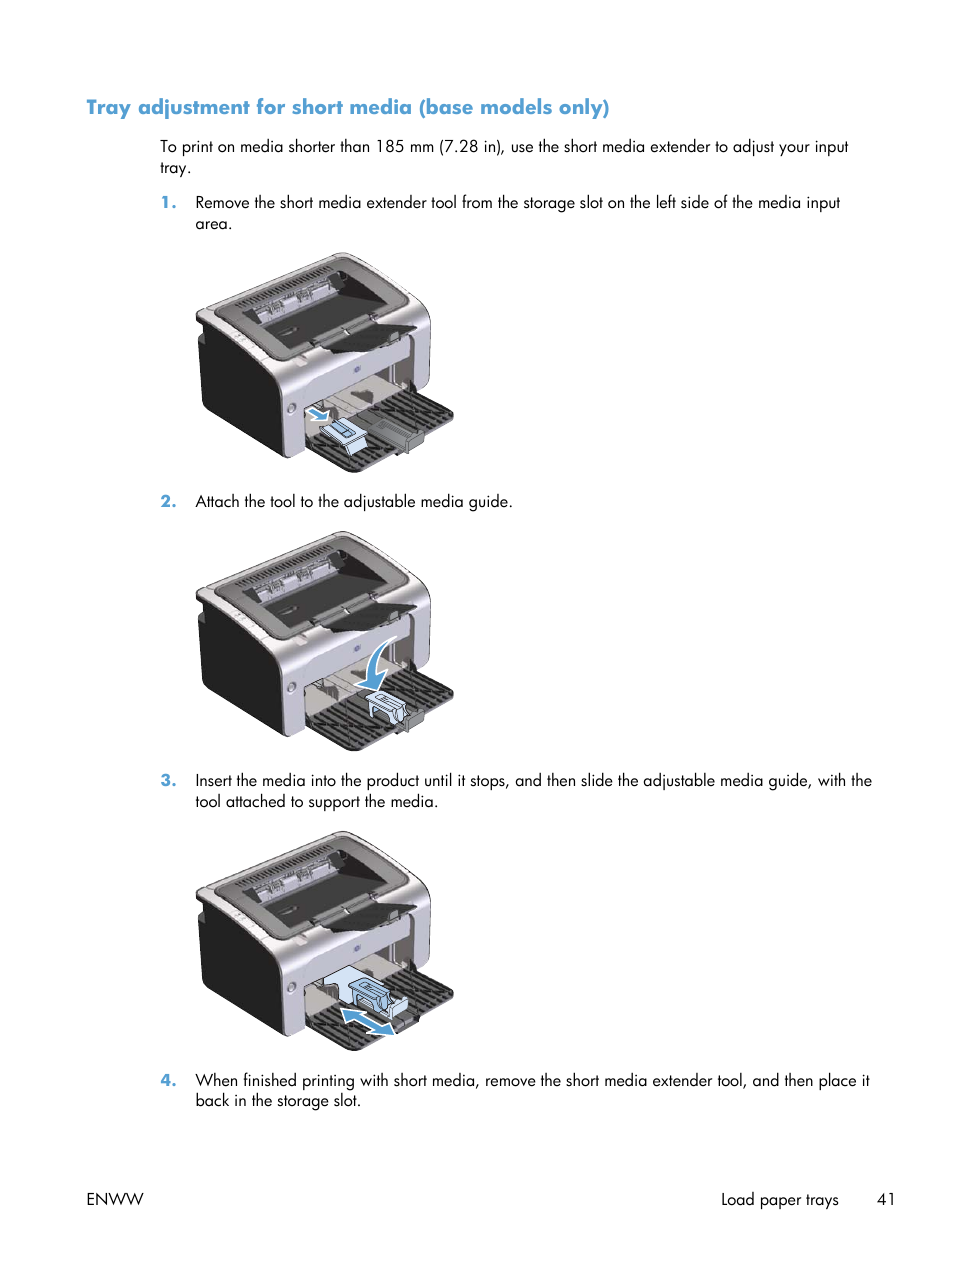 tray adjustment for short media base models only hp laserjet pro rh manualsdir com hp laserjet p1102w manual hp laserjet p1102 manual